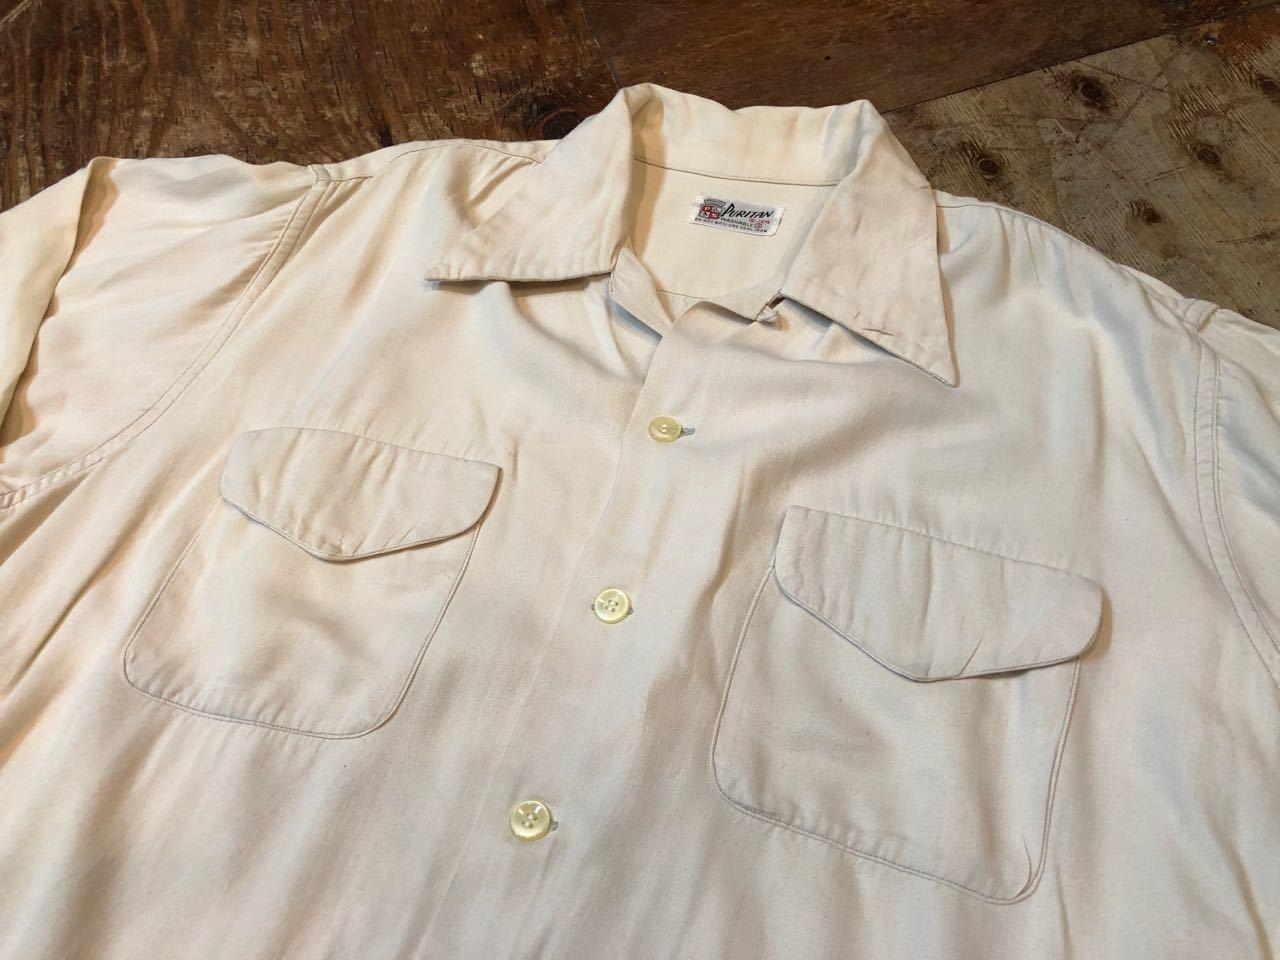 4月13日(土)入荷! 50s PURITAN Gabardine shirts  !_c0144020_13564379.jpg